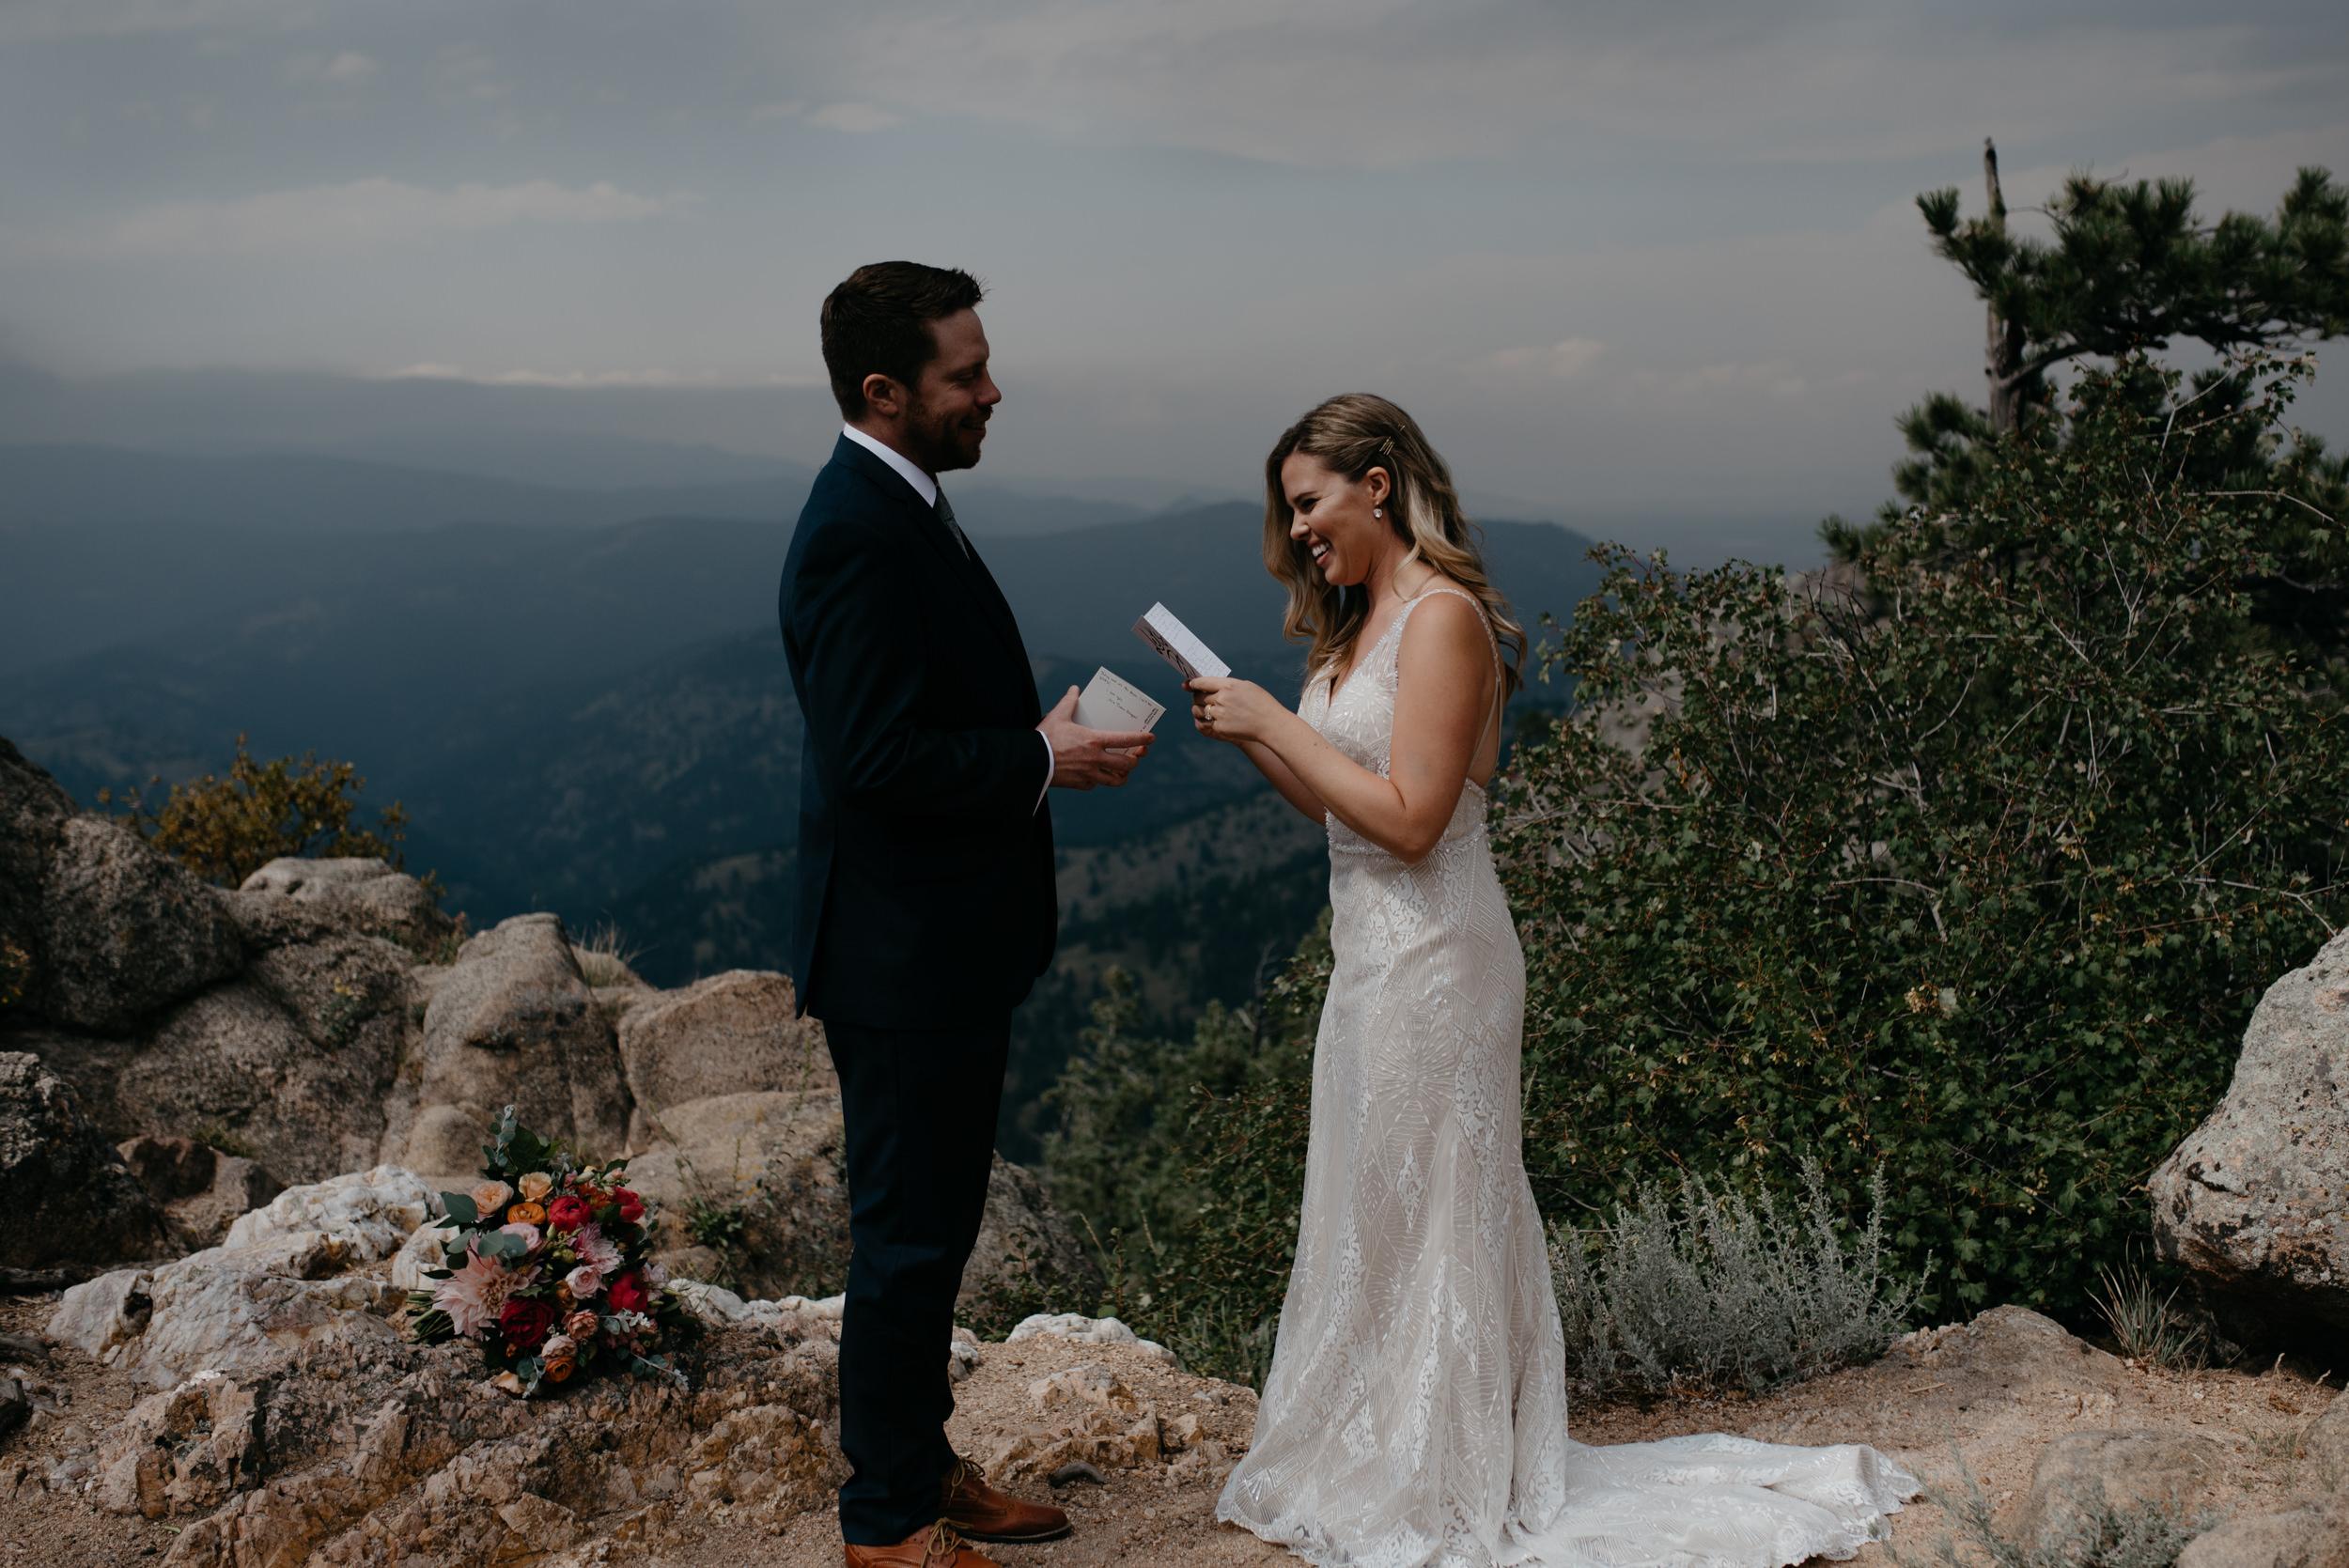 Lost Gulch elopement in Boulder. Boulder elopement and wedding photographer.